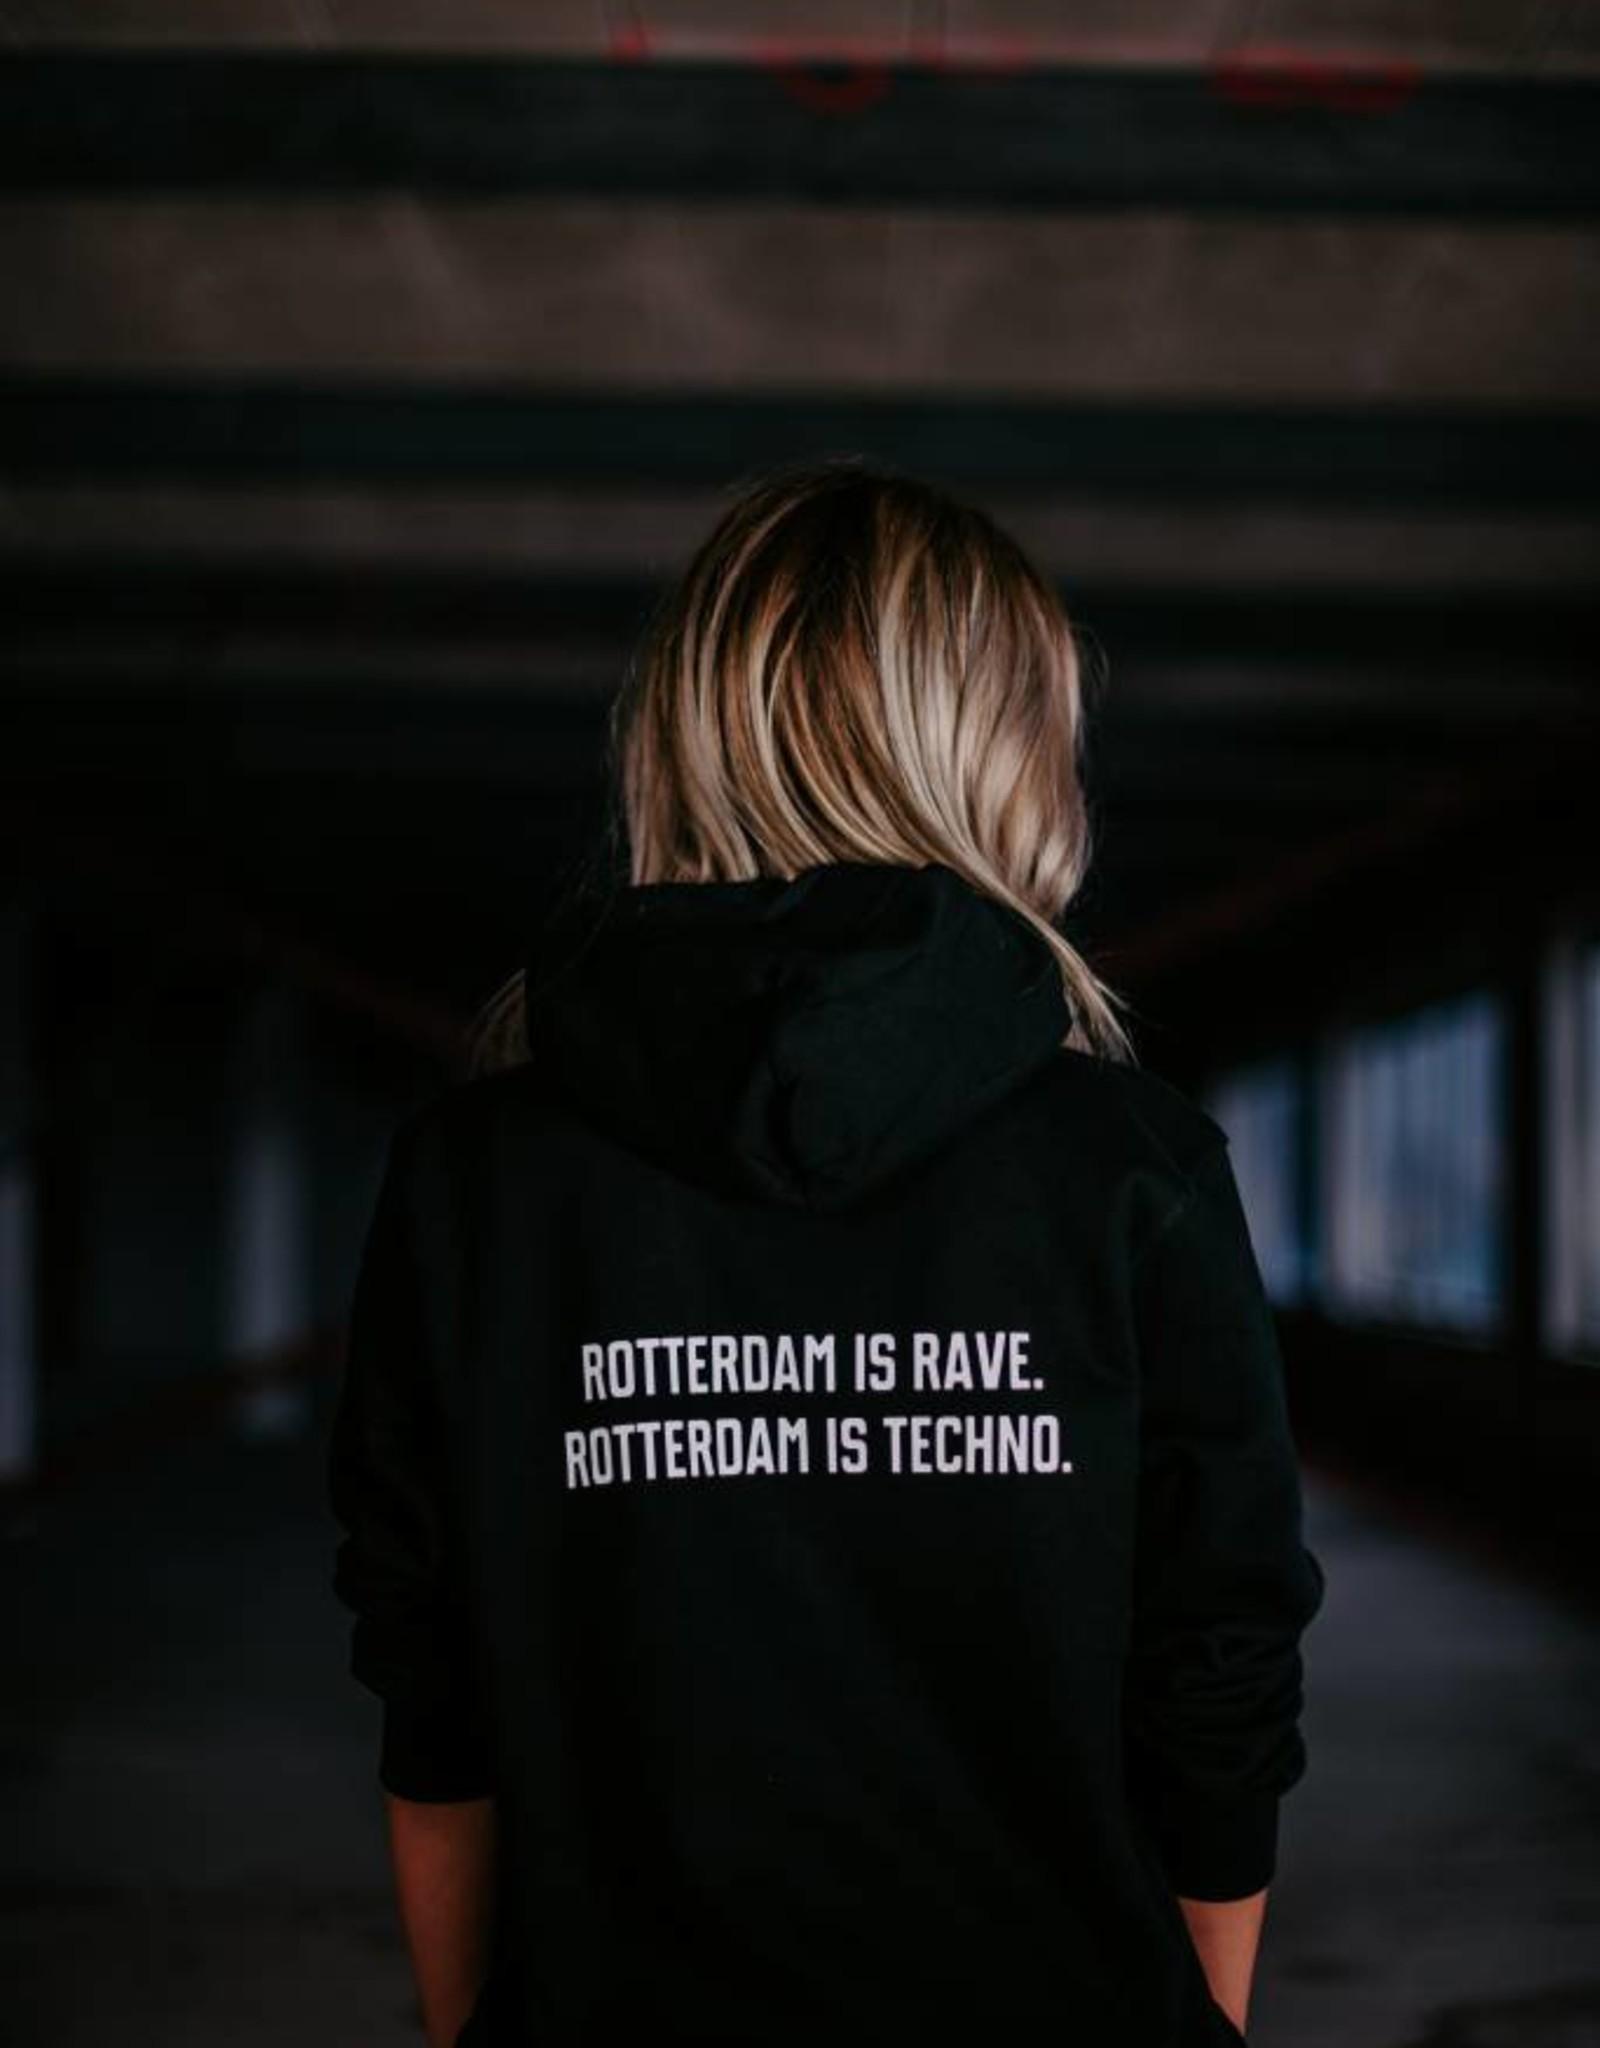 Rotterdam Rave Rotterdam Rave Hoodie Slogan (Unisex)